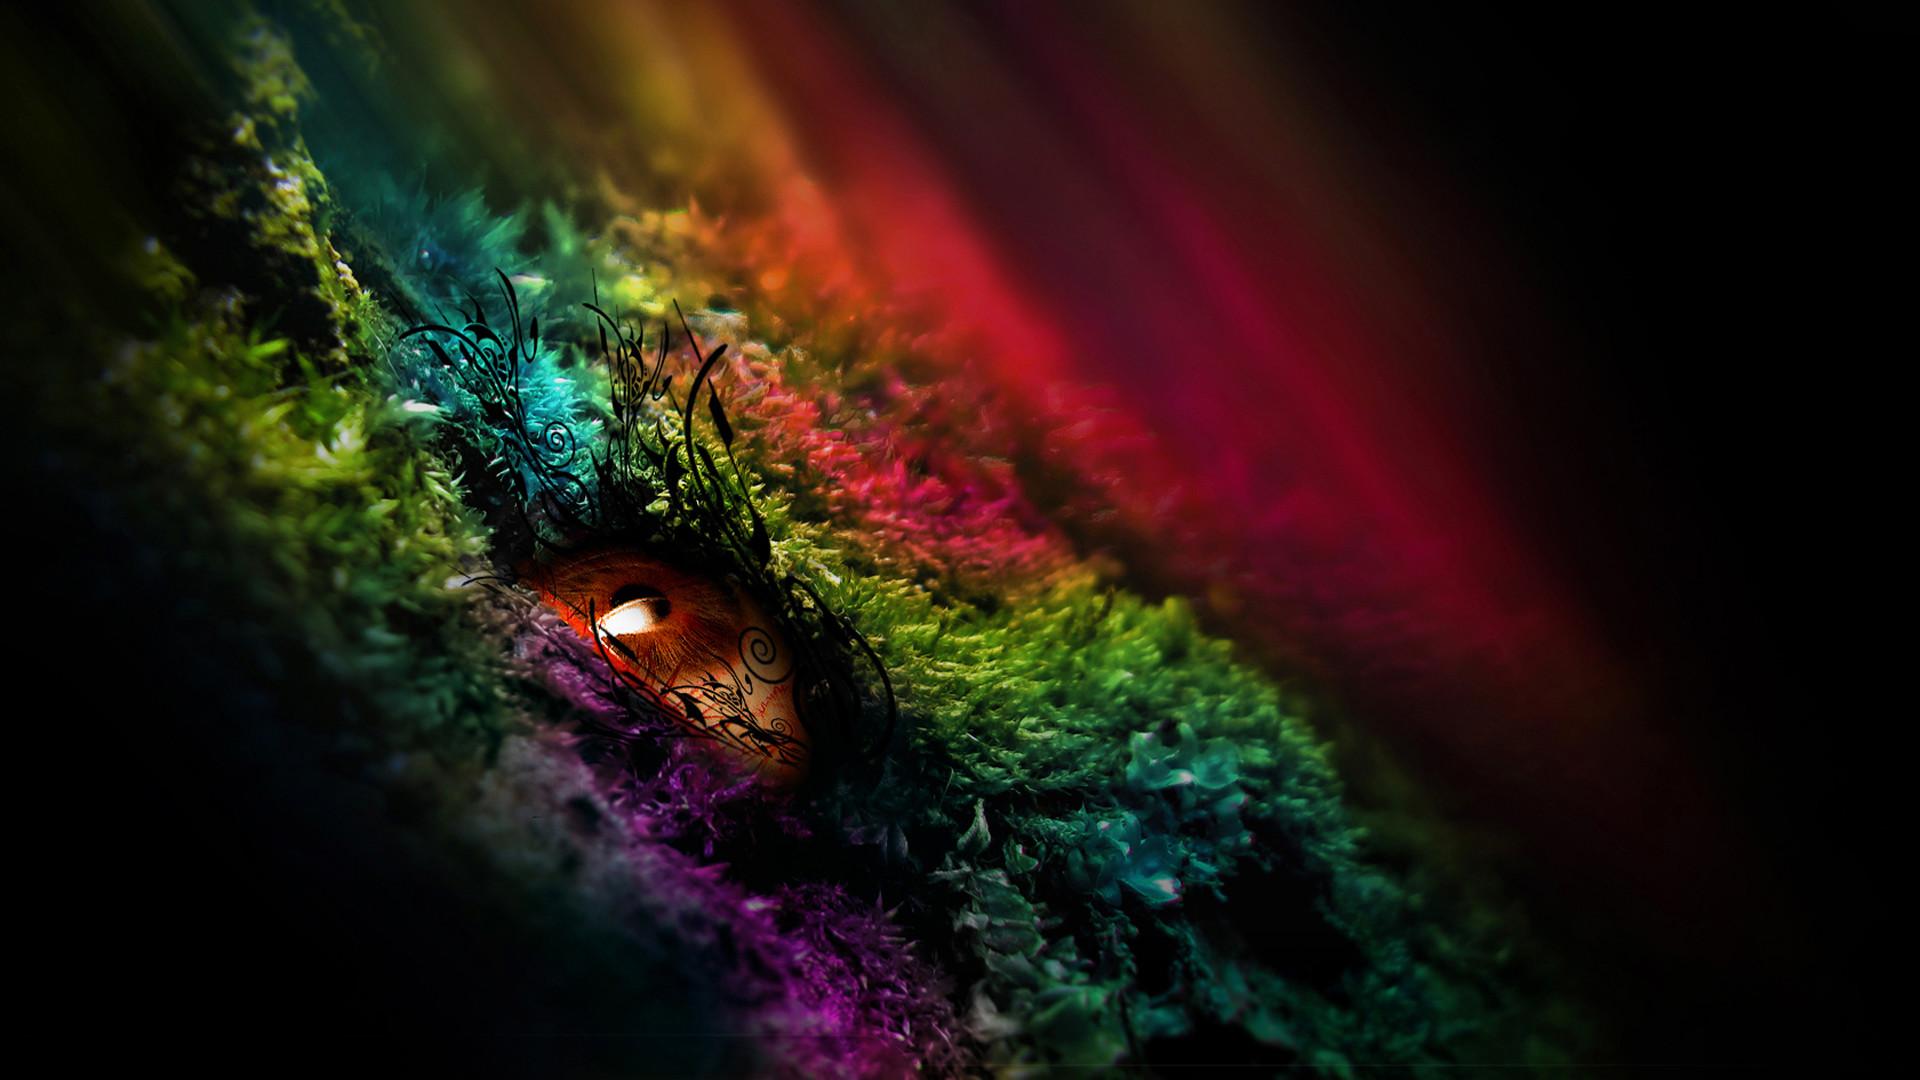 Color HD Wallpaper 75 images